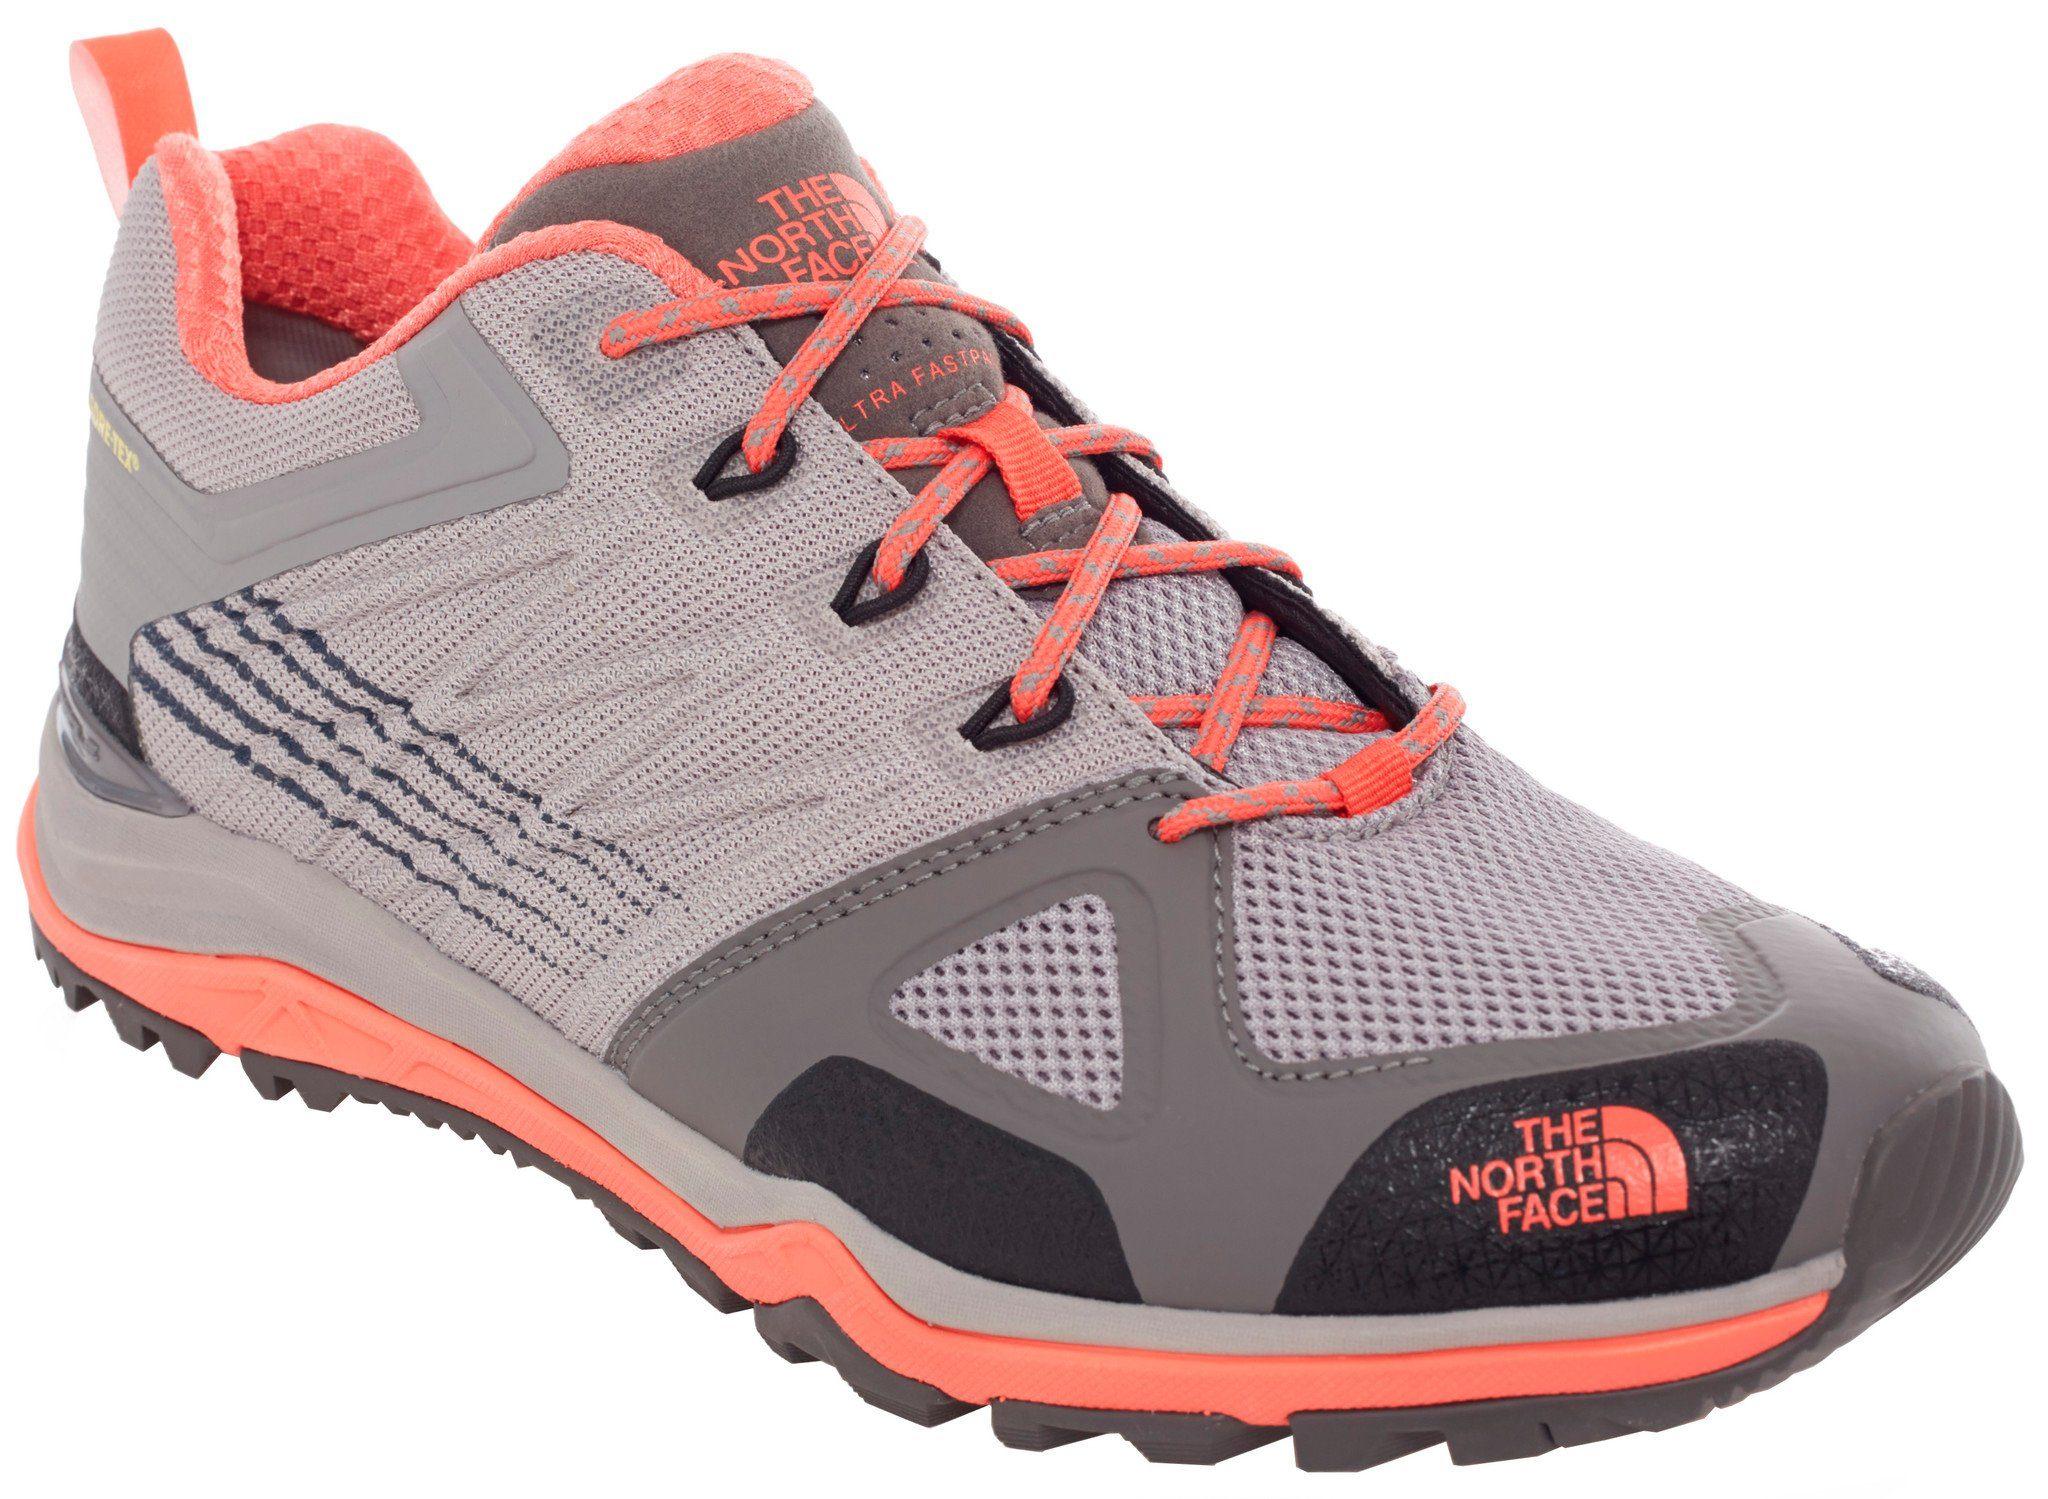 The North Face Kletterschuh Ultra Fastpack 2 GTX Shoes Women online kaufen  grau